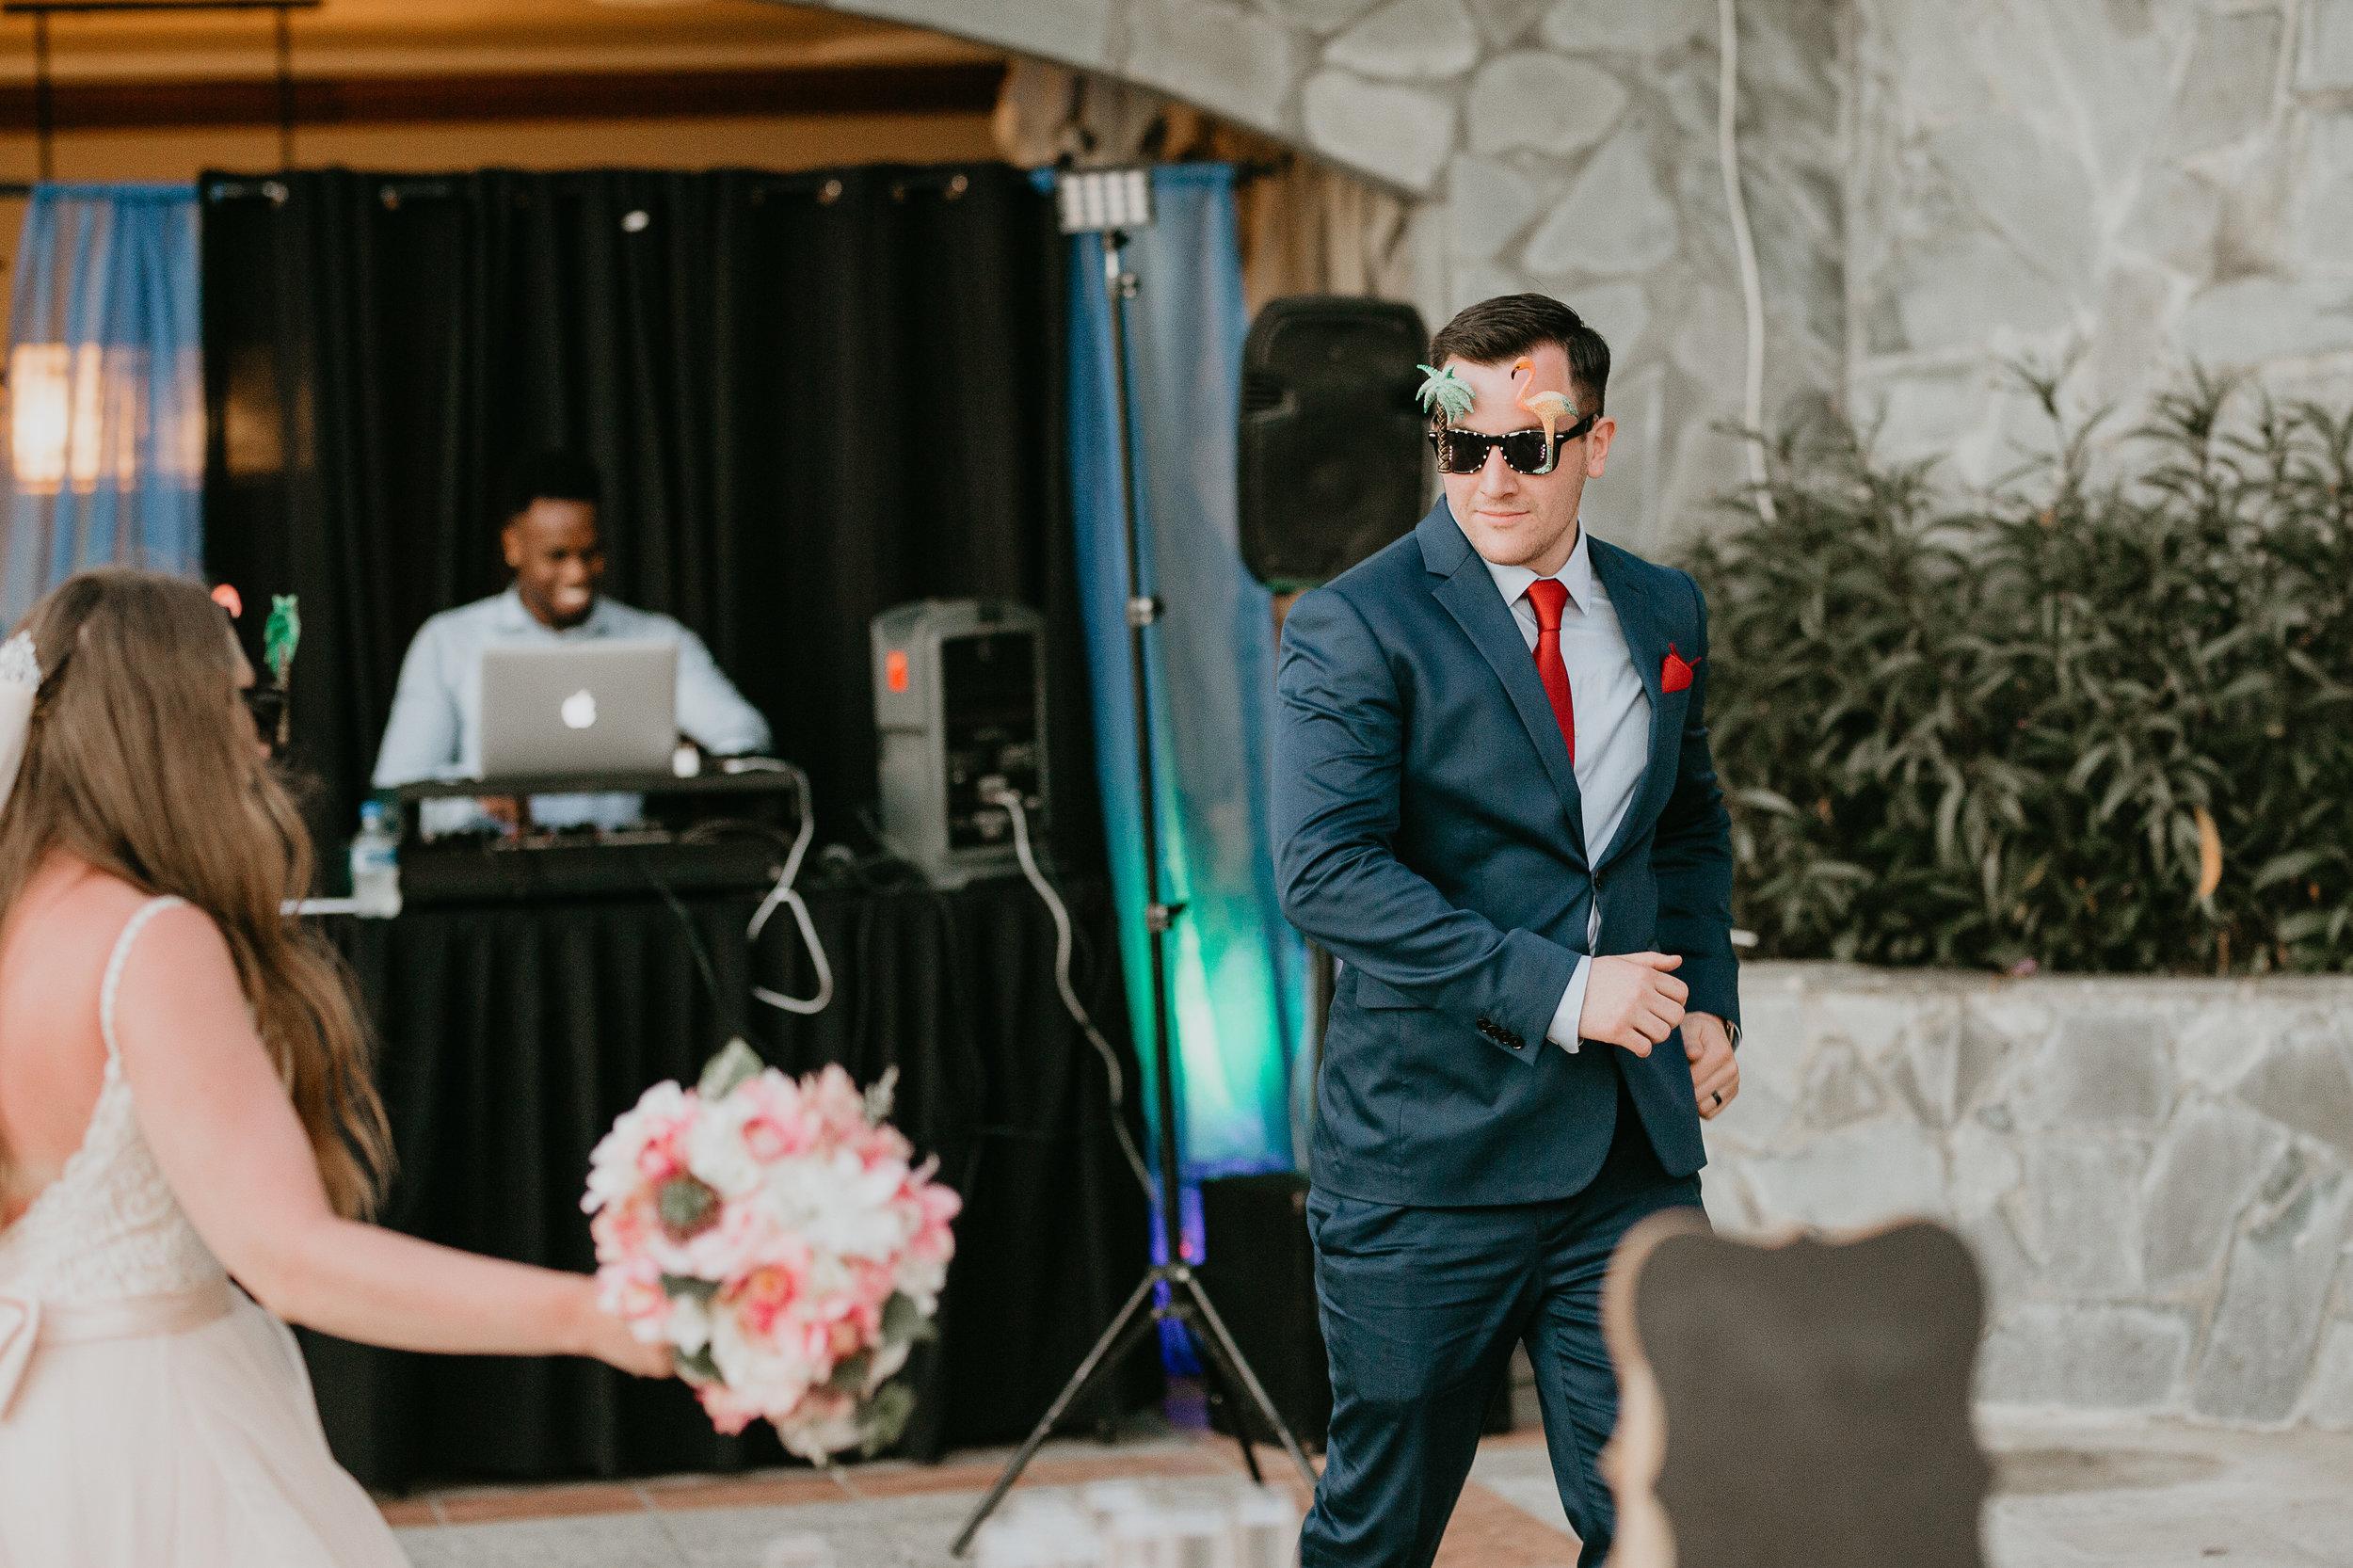 nicole-daacke-photography-destination-wedding-in-st-lucia-sandals-la-toc-intimate-island-wedding-carribean-elopement-photographer-chill-island-wedding-128.jpg